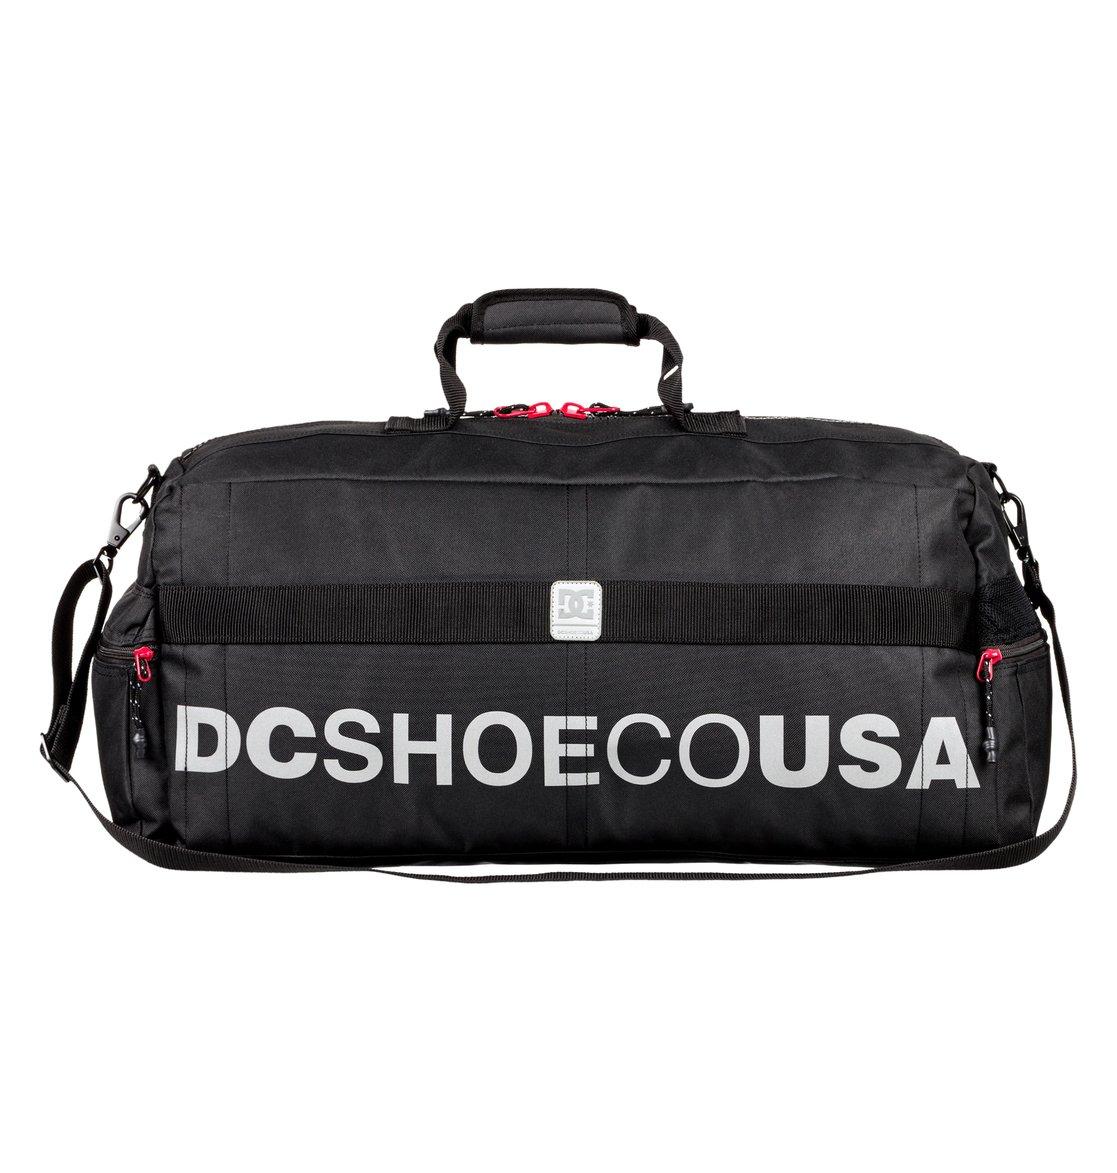 Btenberger 40l Large Duffle Bag